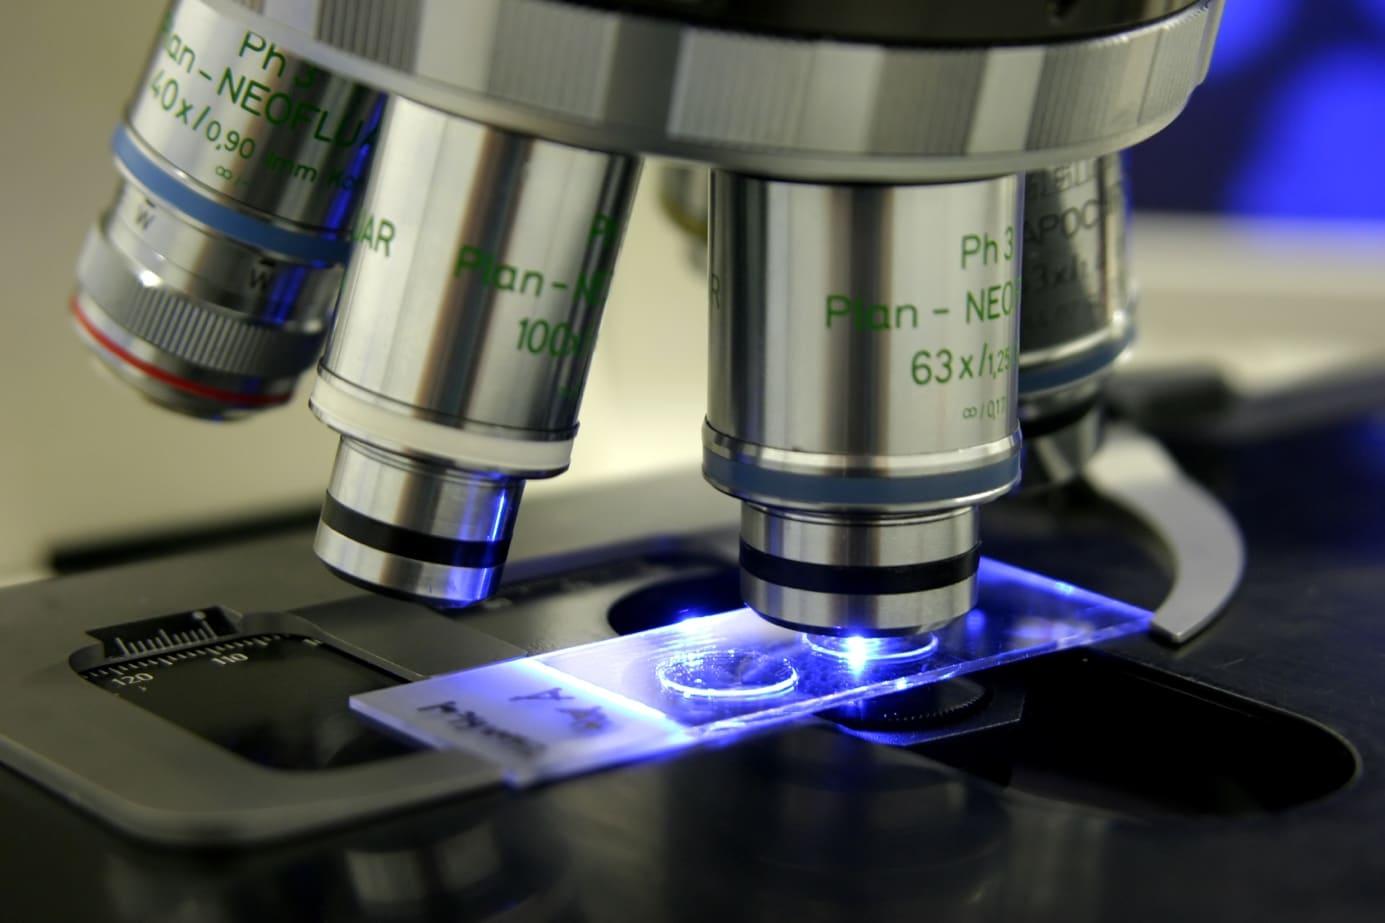 OVIklinika Laboratorium Aktywacja oocytow